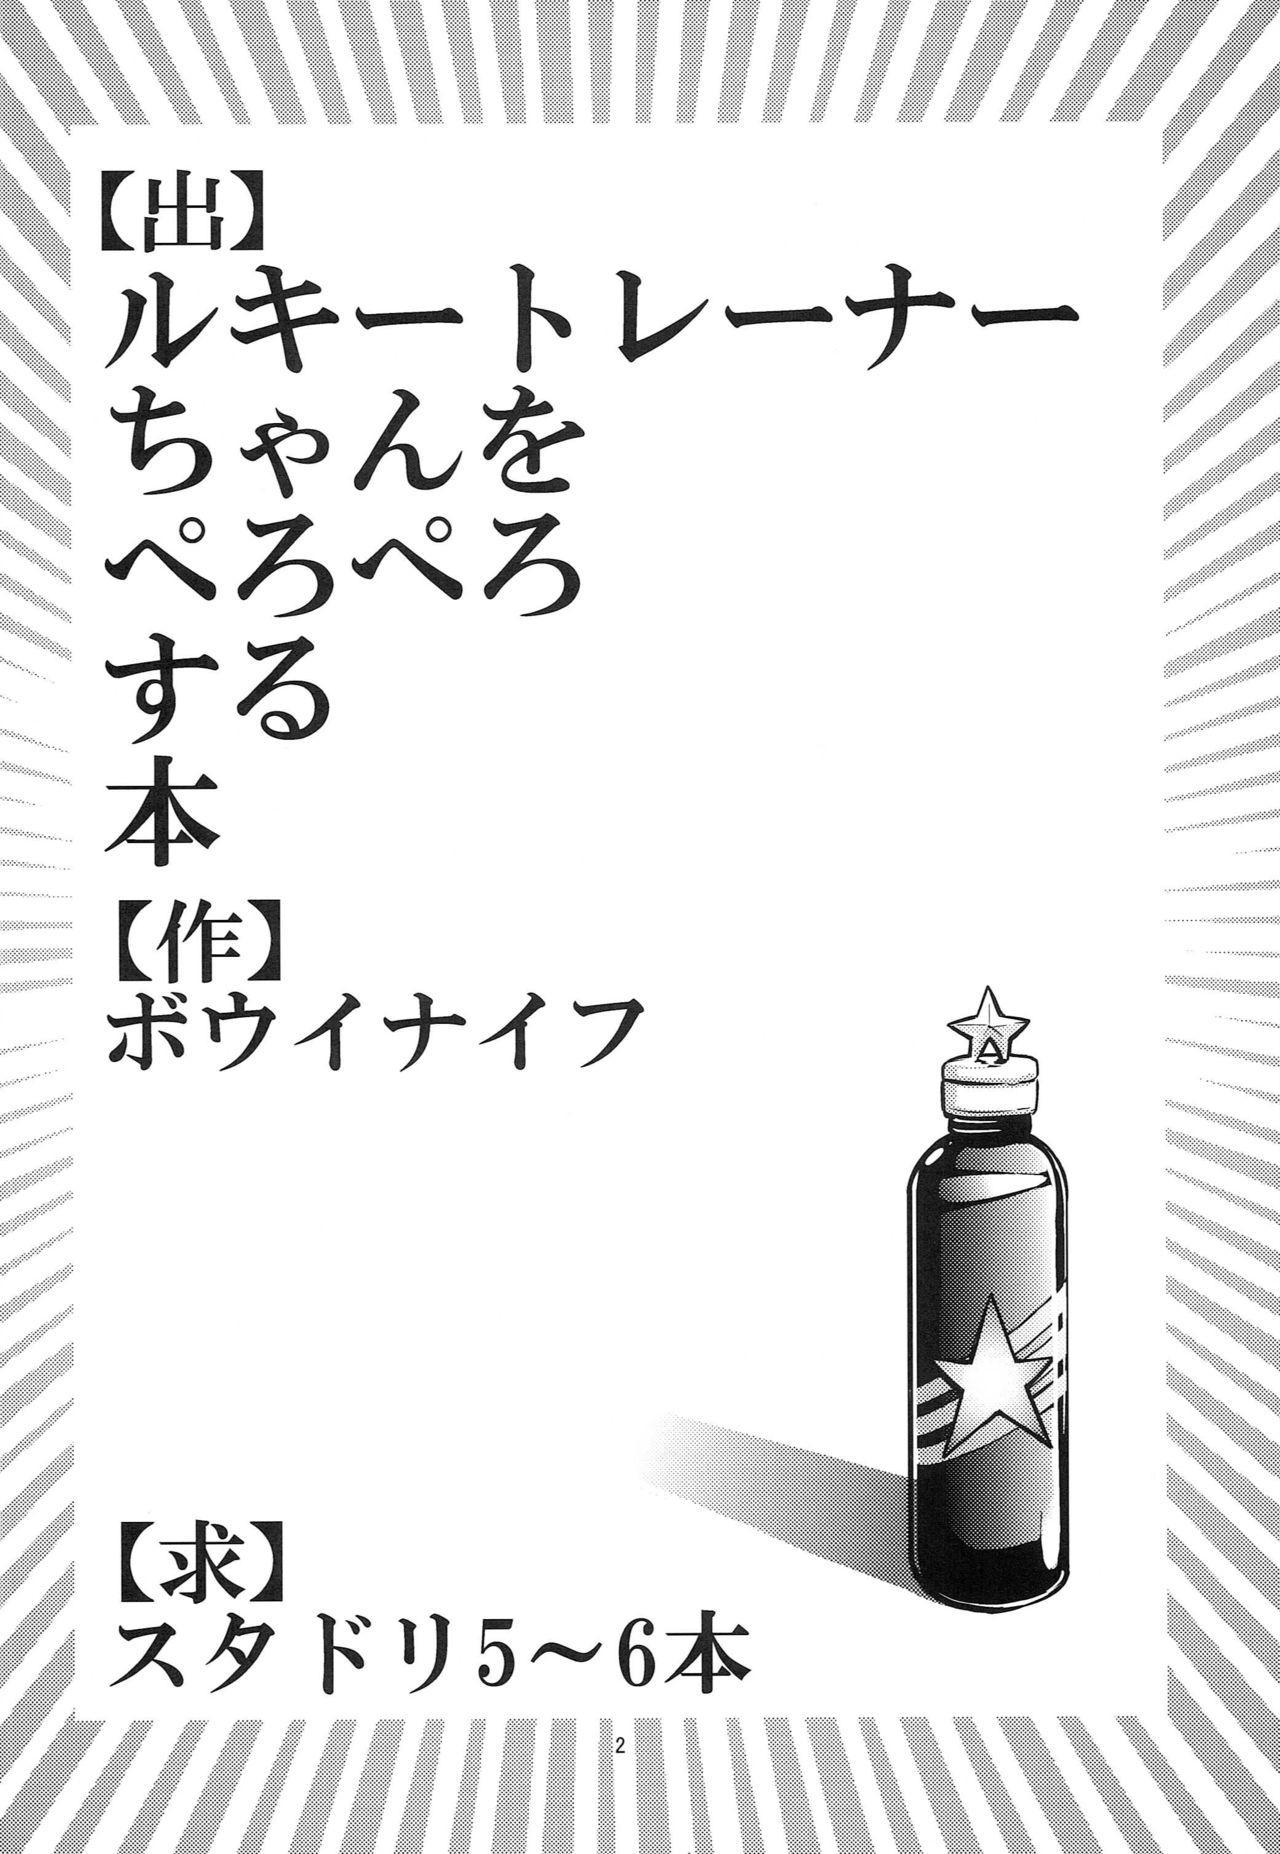 Ruki Pero 2